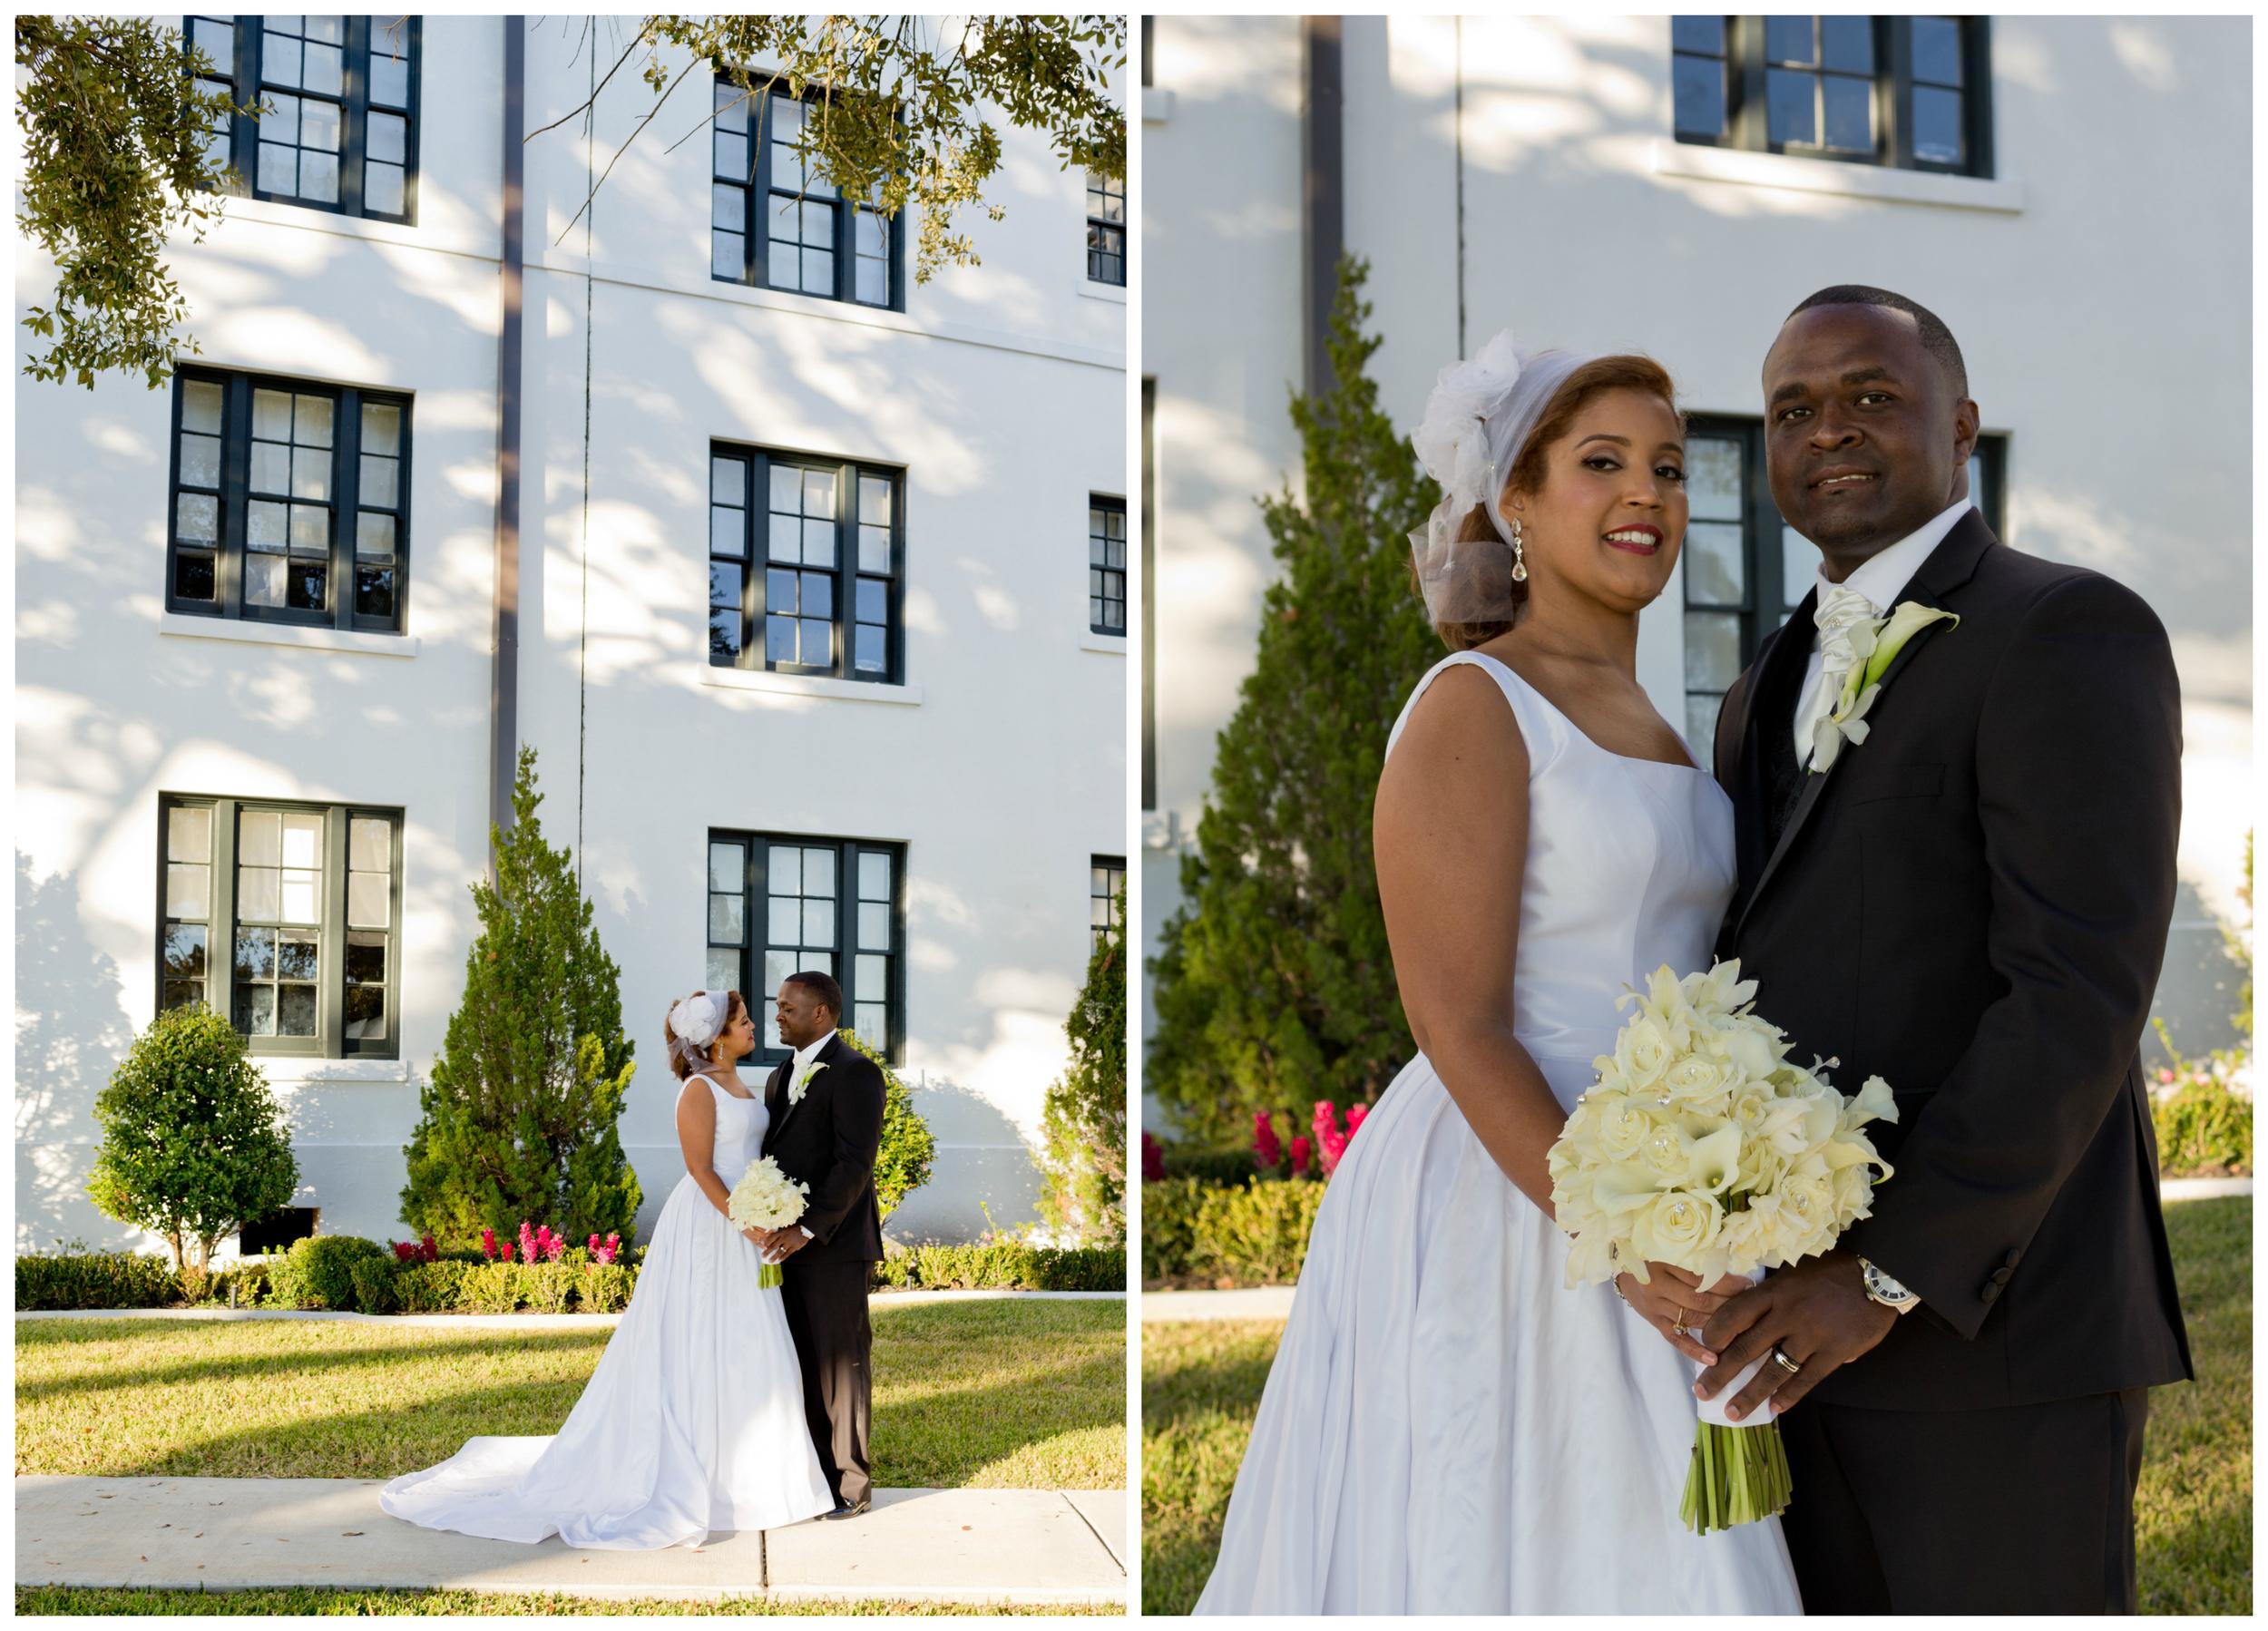 Biloxi Wedding Photographer (Uninvented Colors Photography)